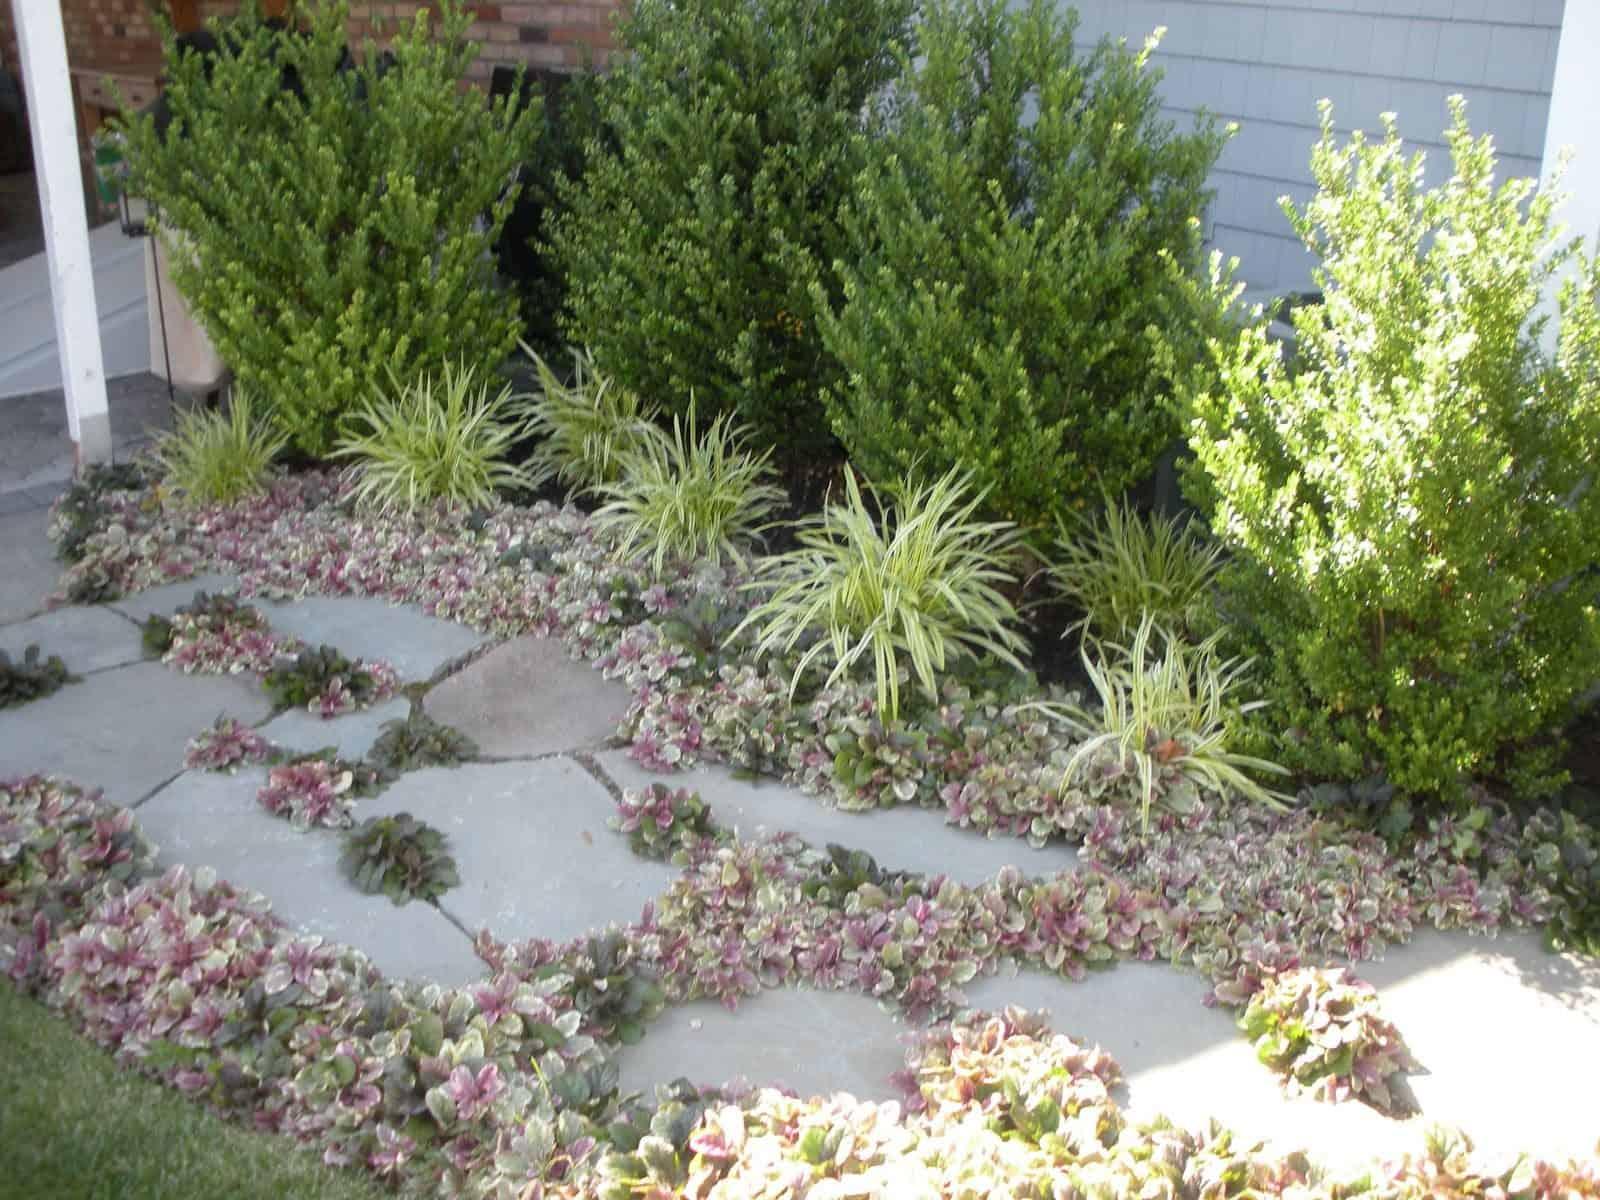 Landscape Plantings - Ajuga ground cover with Vareigated Liriope and Ilex Steeds - Massapequa, Long Island NY